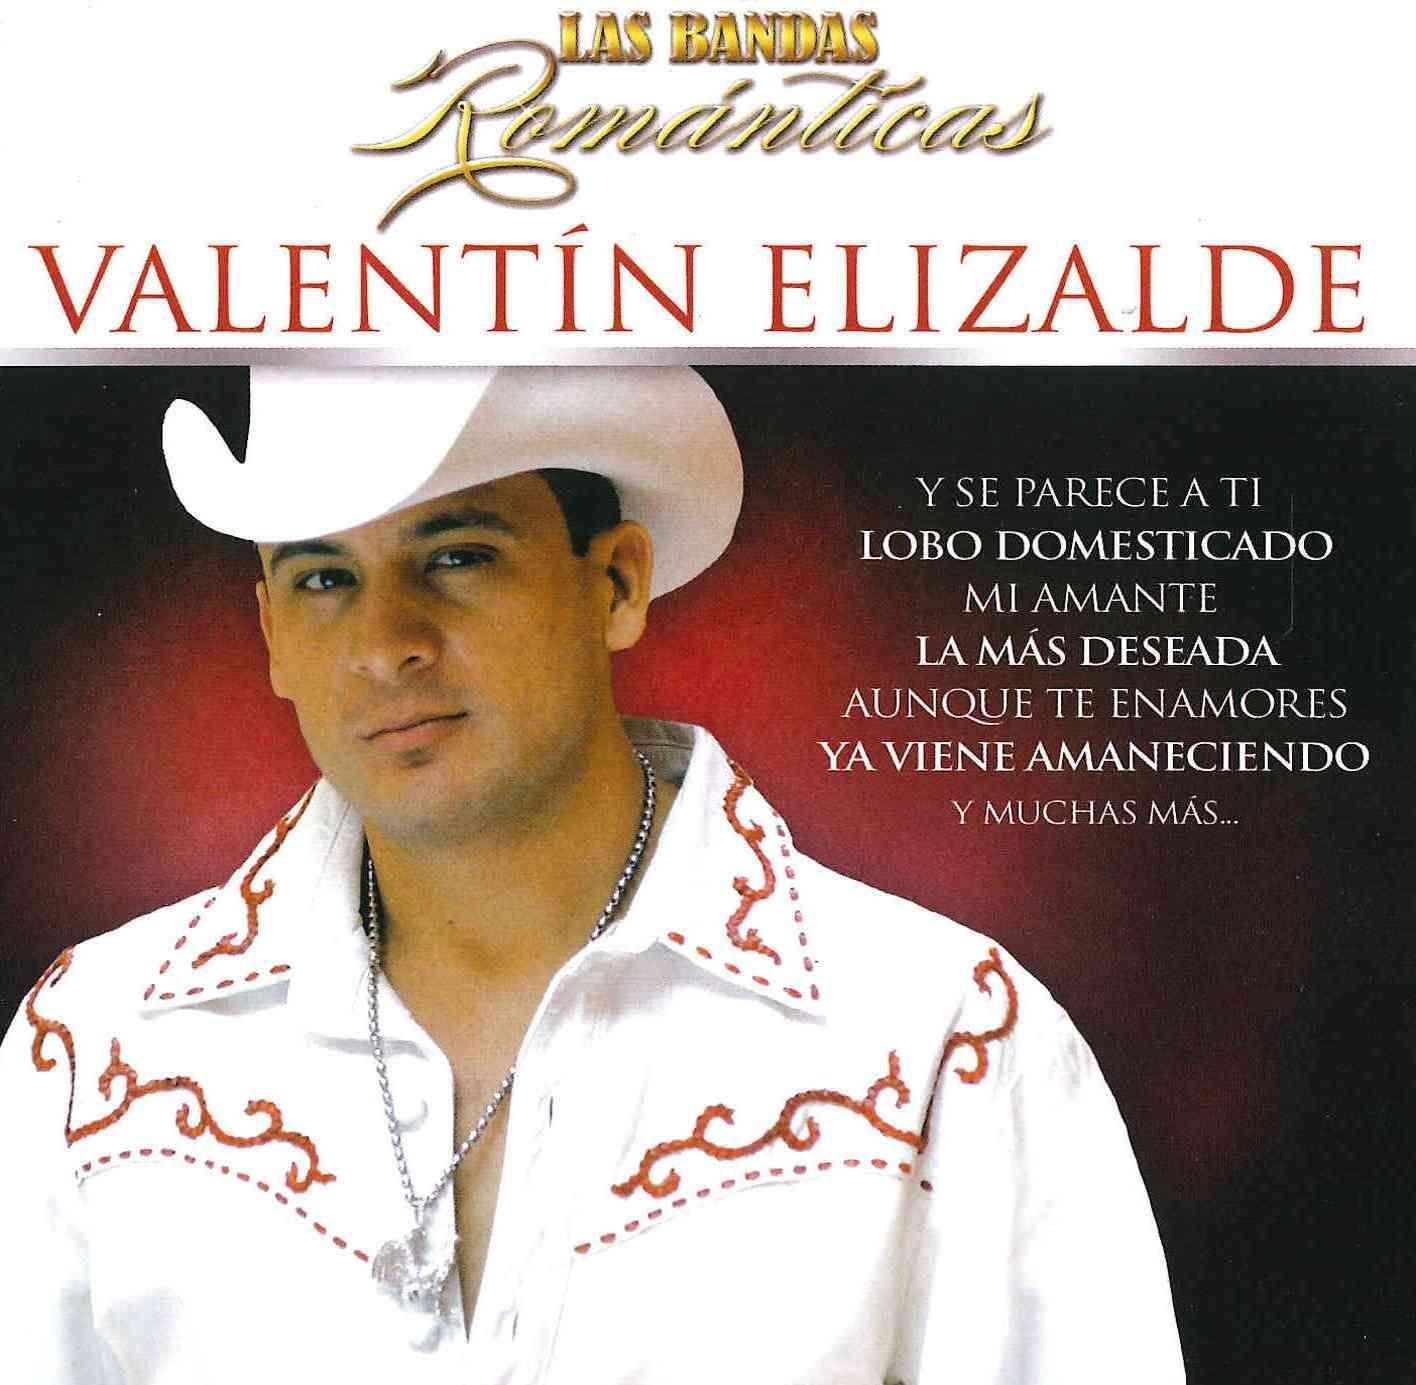 Perfekt Valentin Elizalde   Las Bandas Romanticas